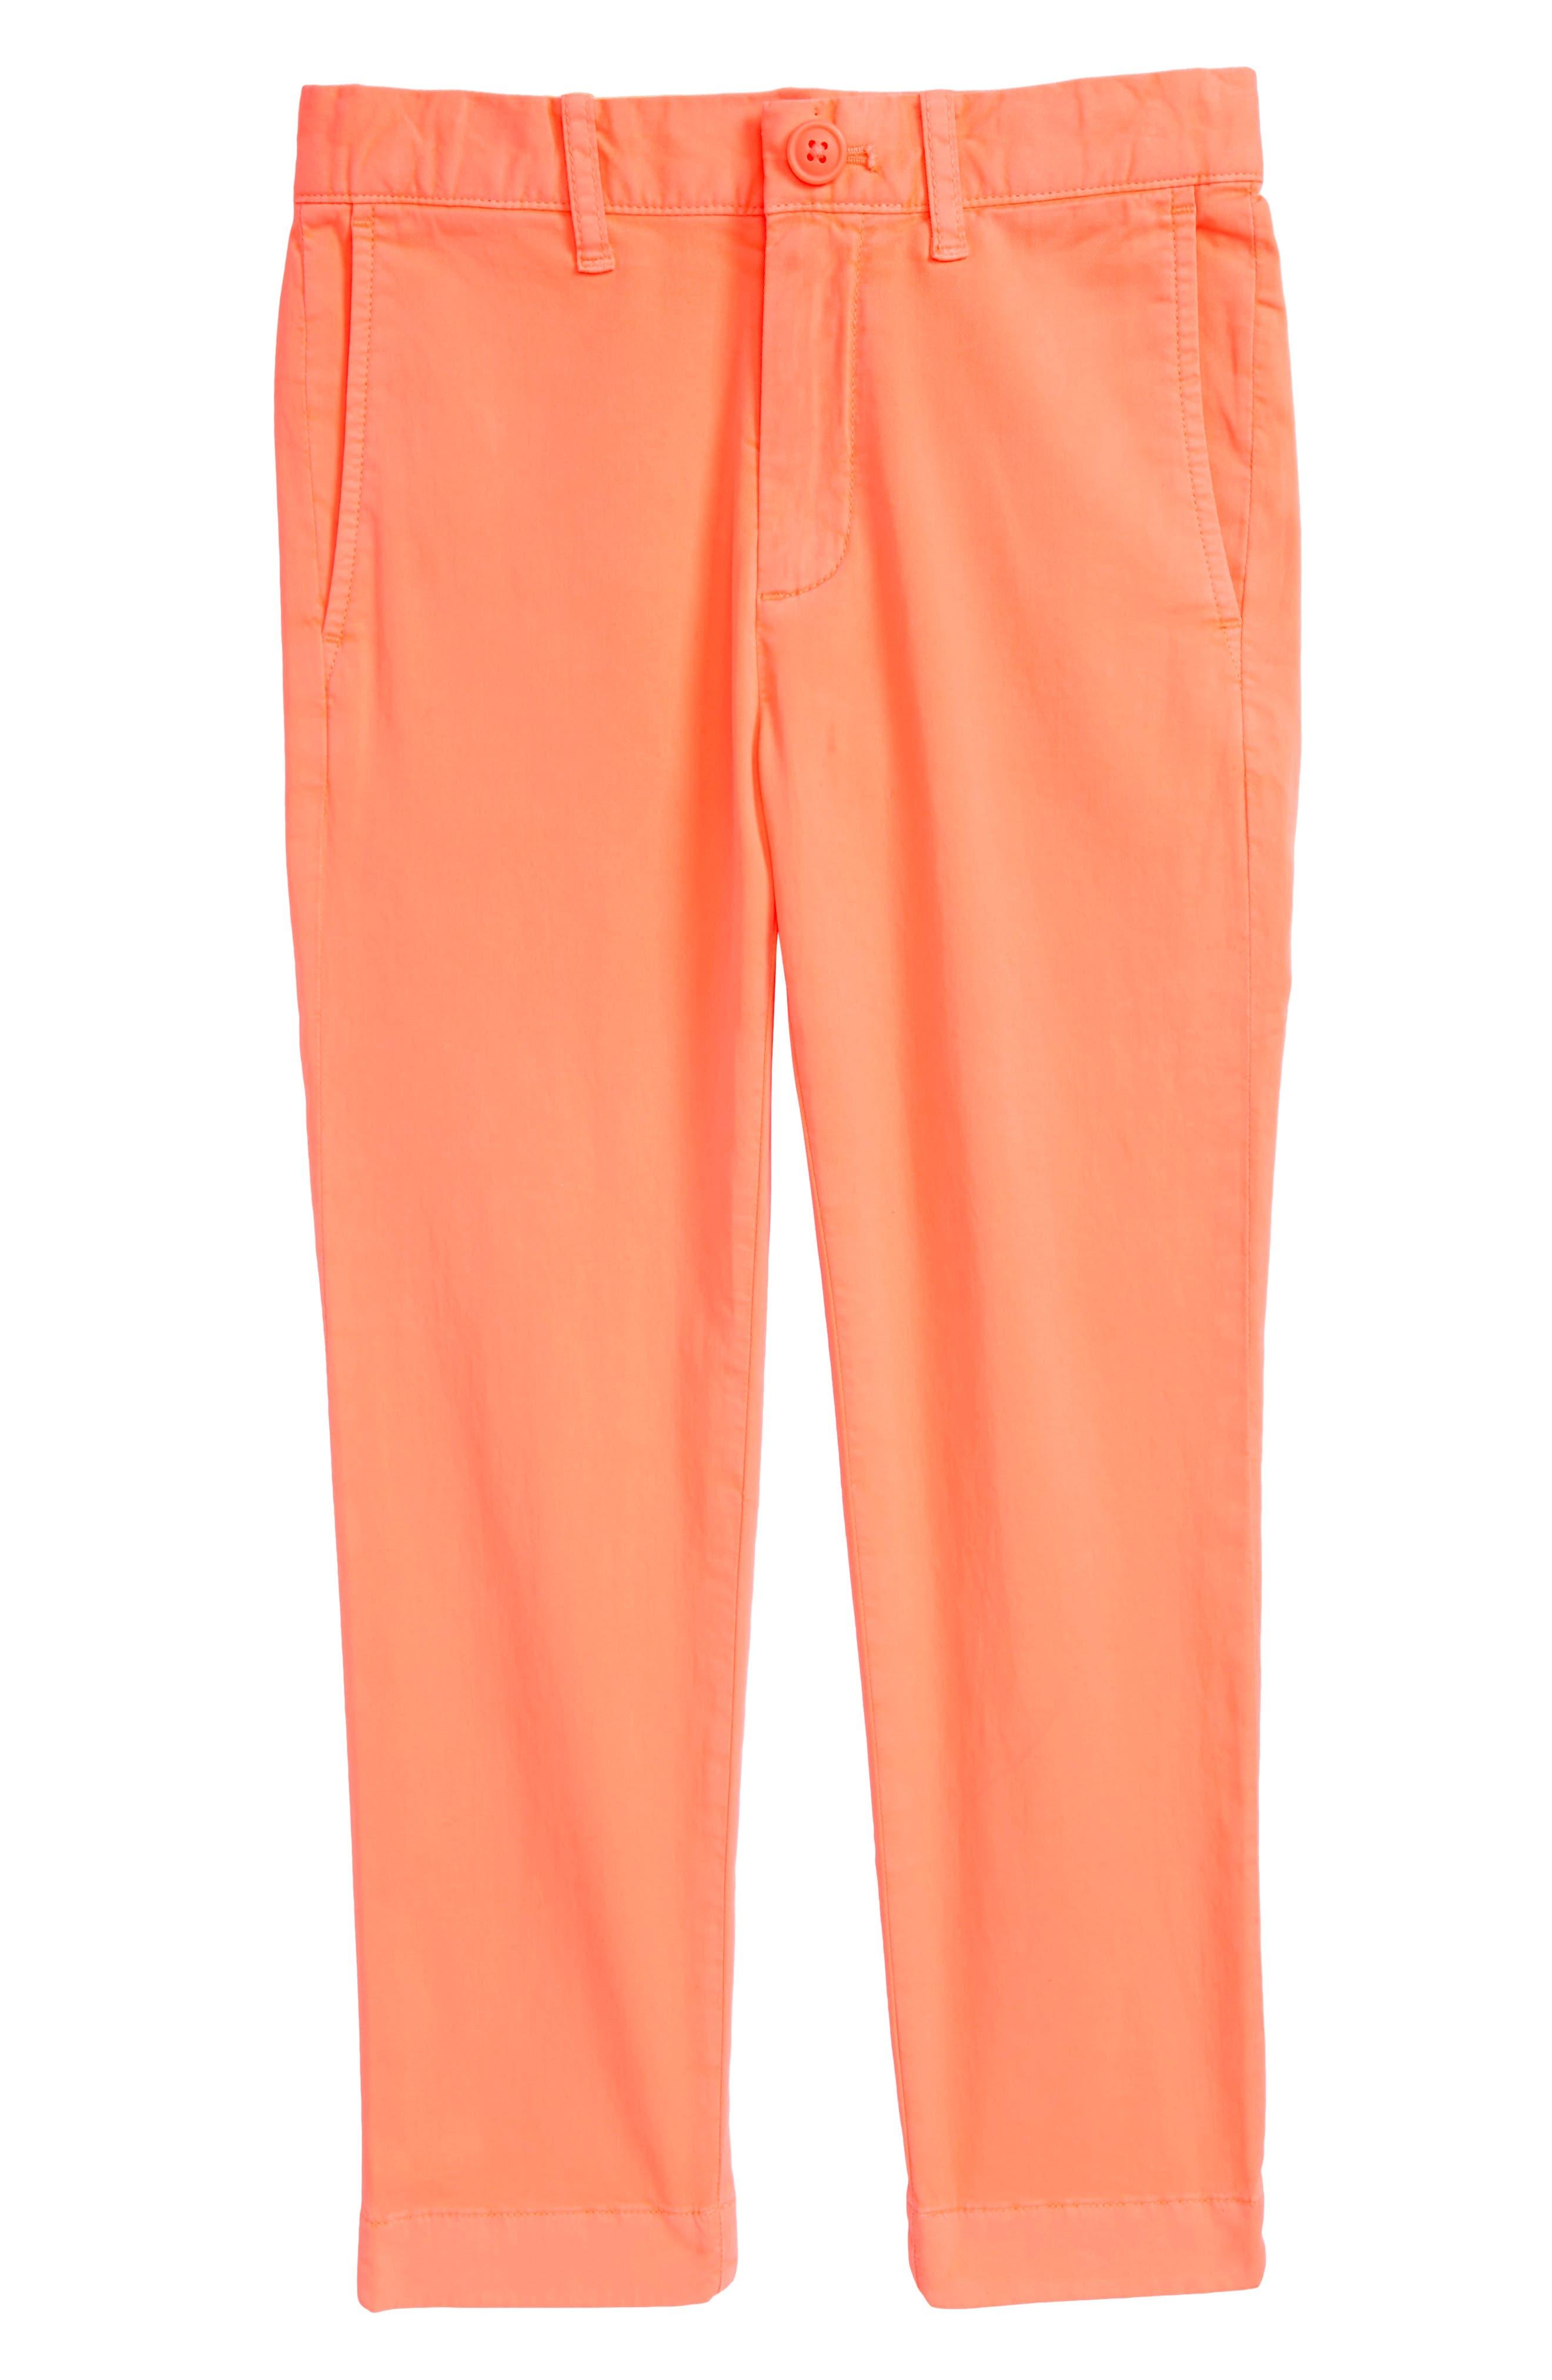 Skinny Stretch Chino Pants,                             Main thumbnail 1, color,                             Neon Coral